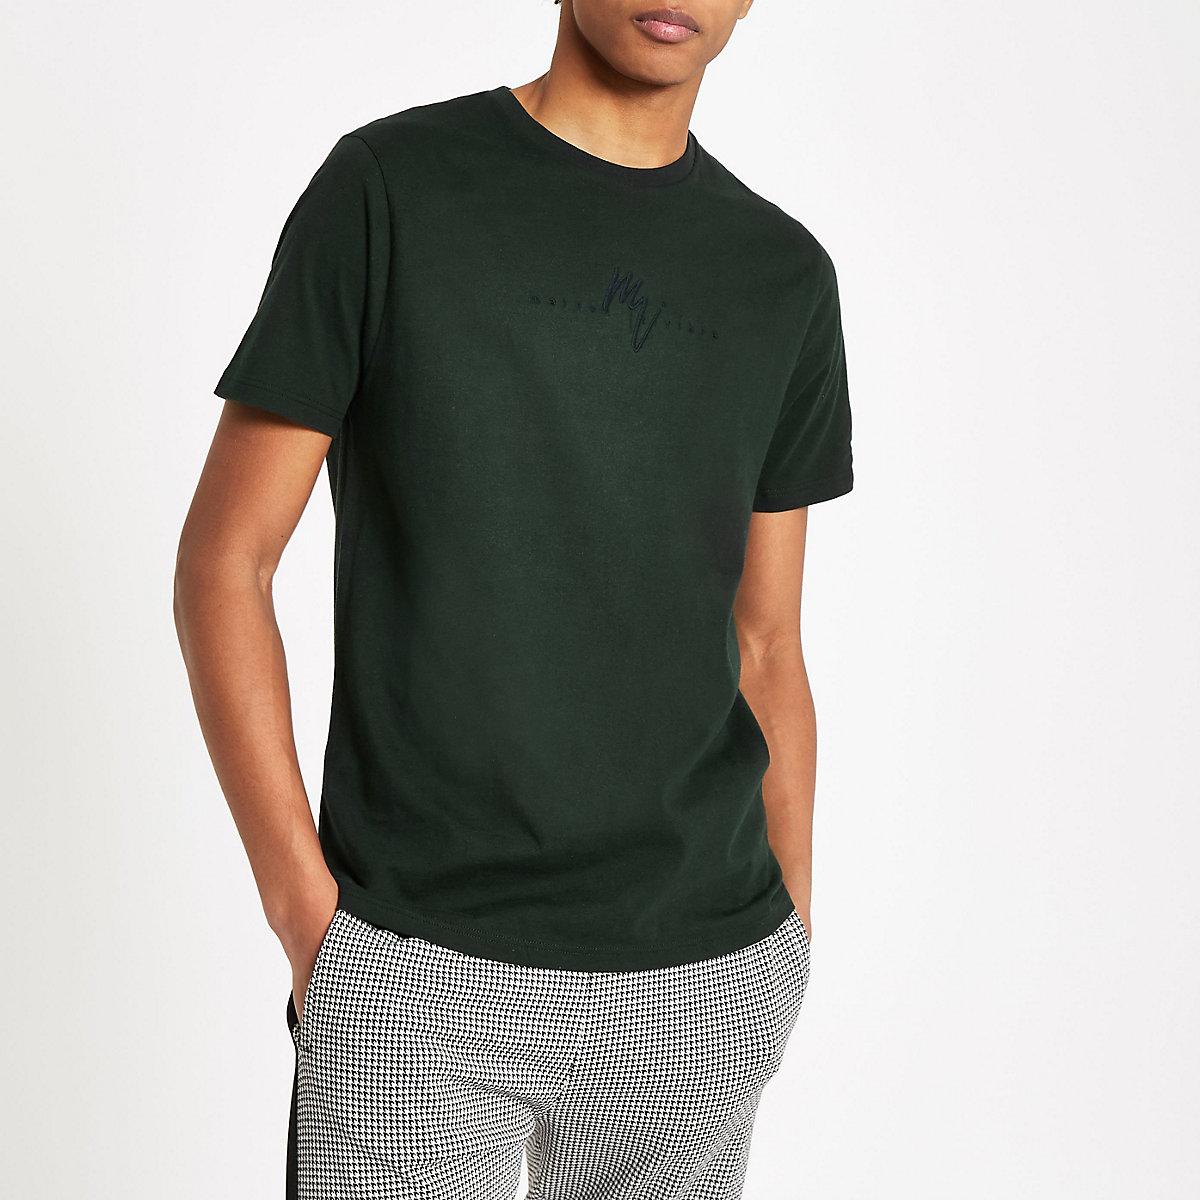 Green 'Maison Riviera' slim fit T-shirt